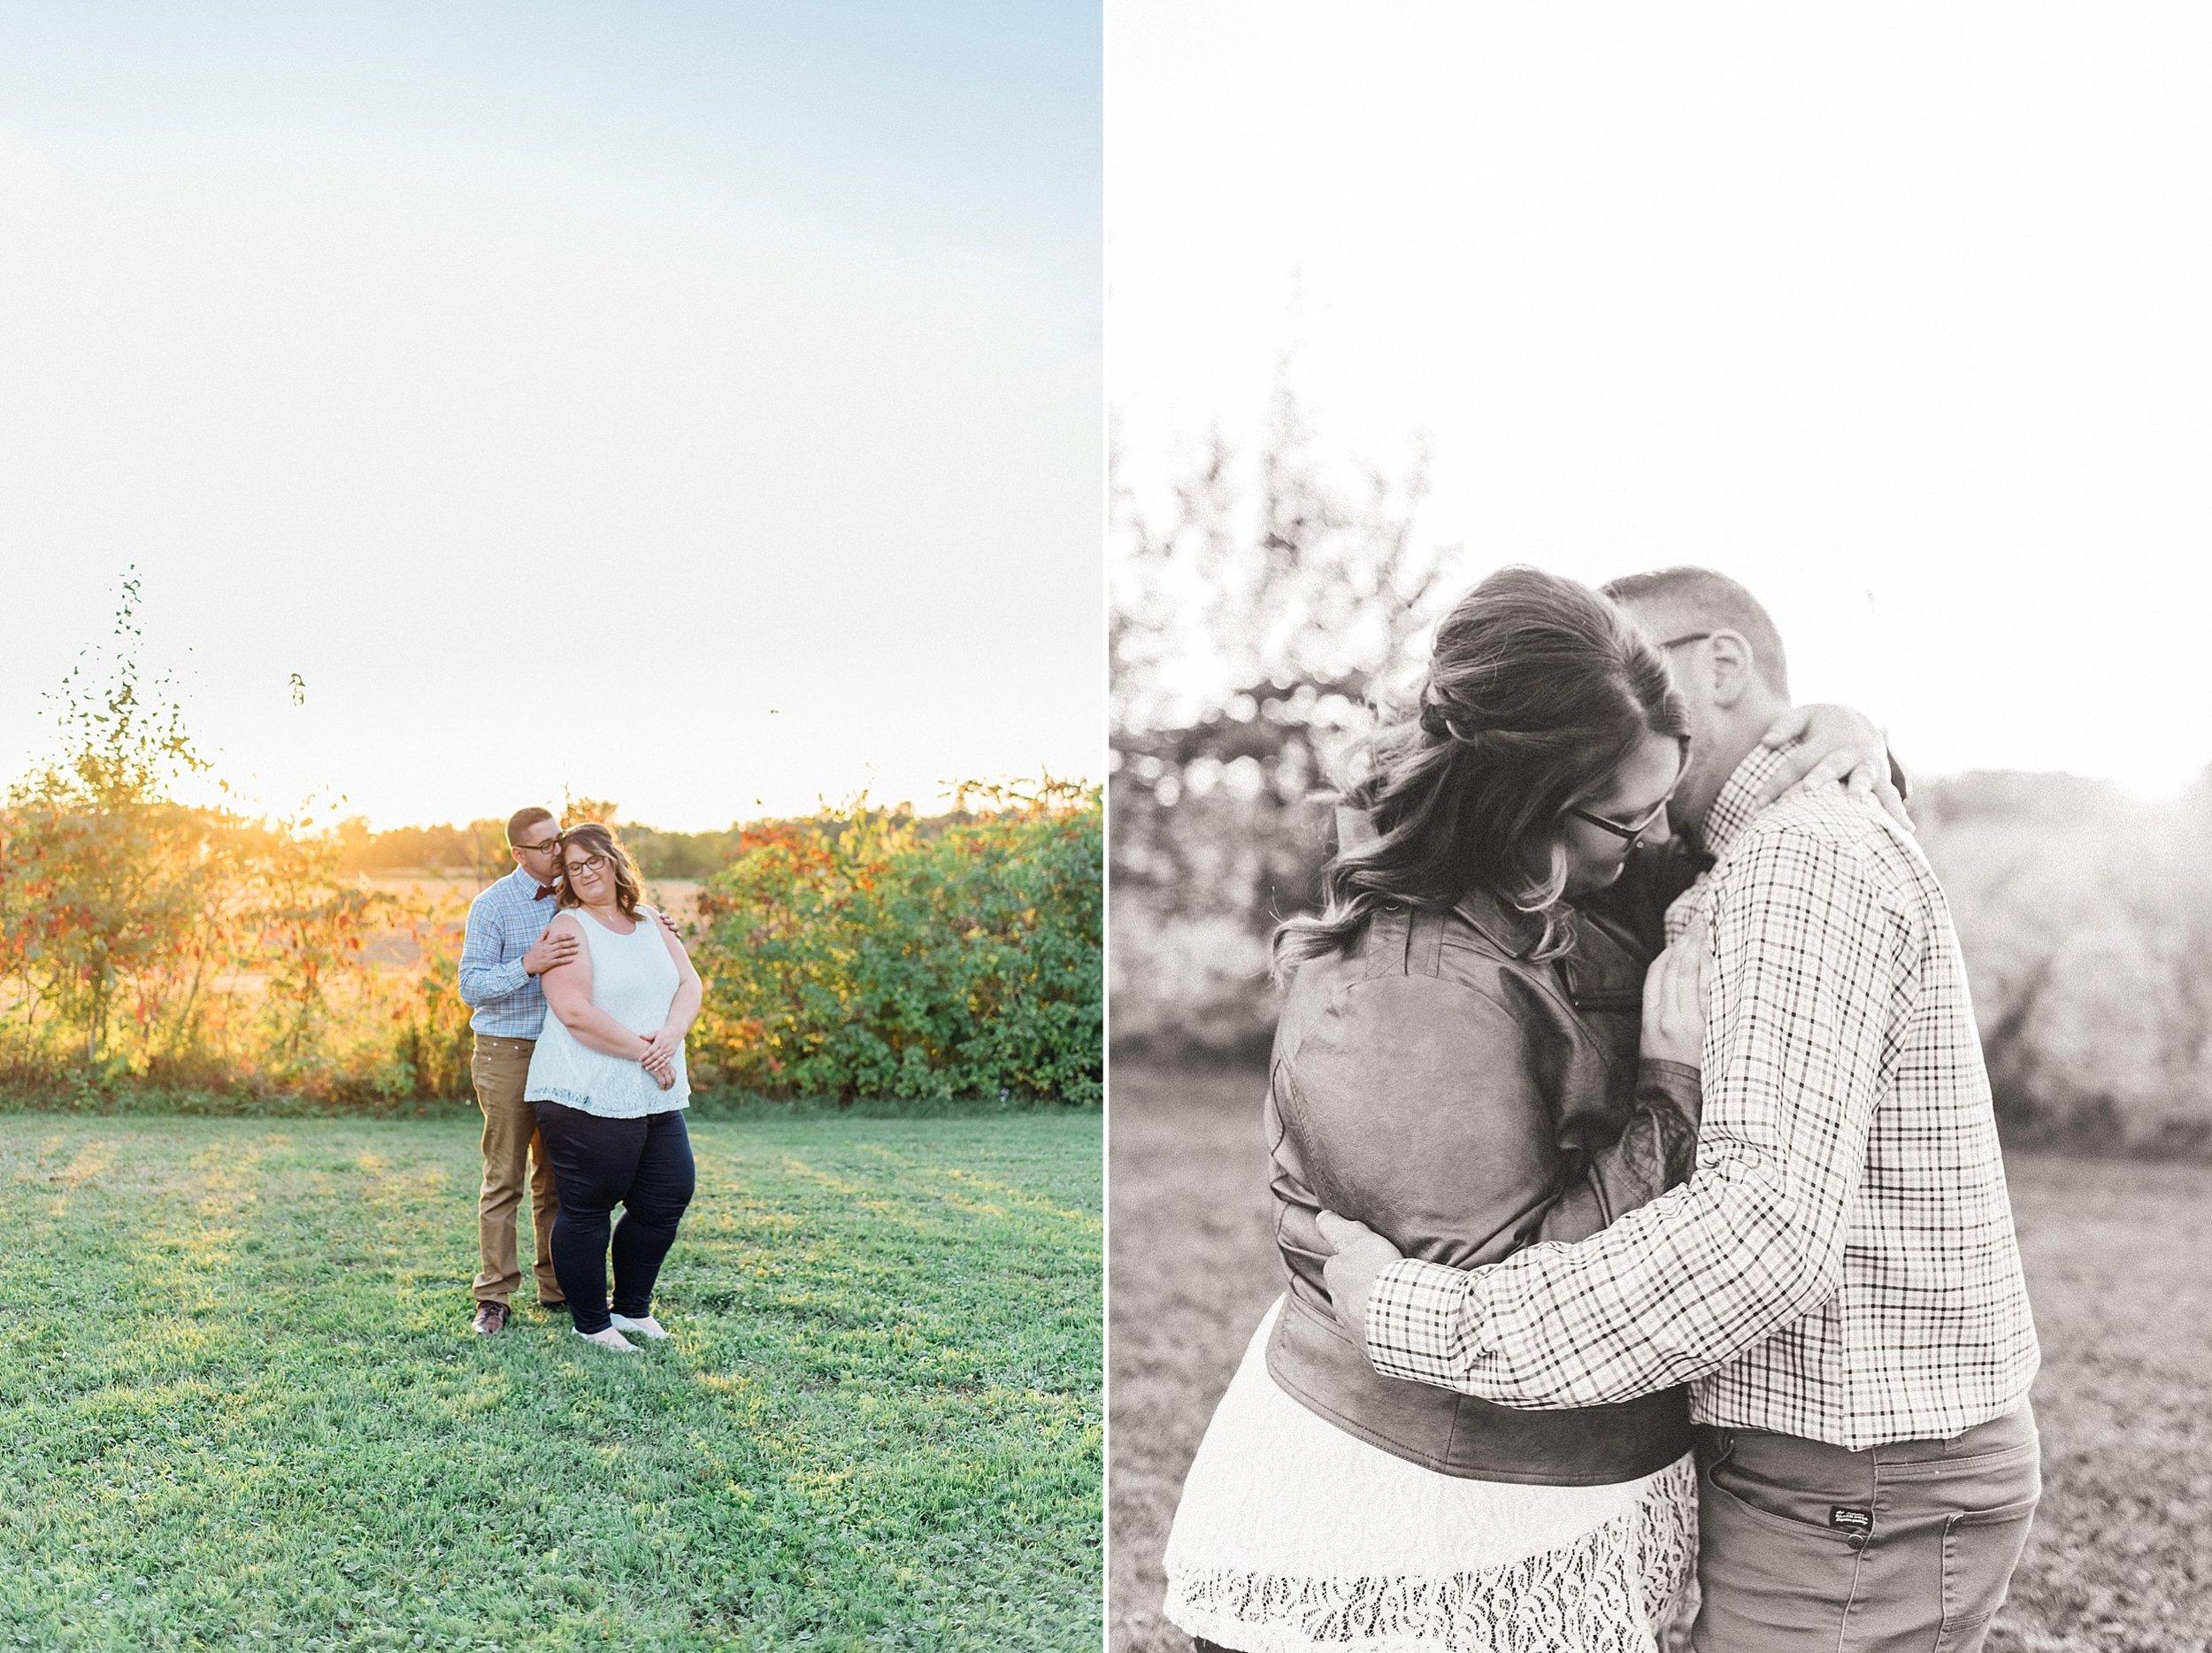 Ali and Batoul Photography - light, airy, indie documentary Ottawa wedding photographer_0172.jpg